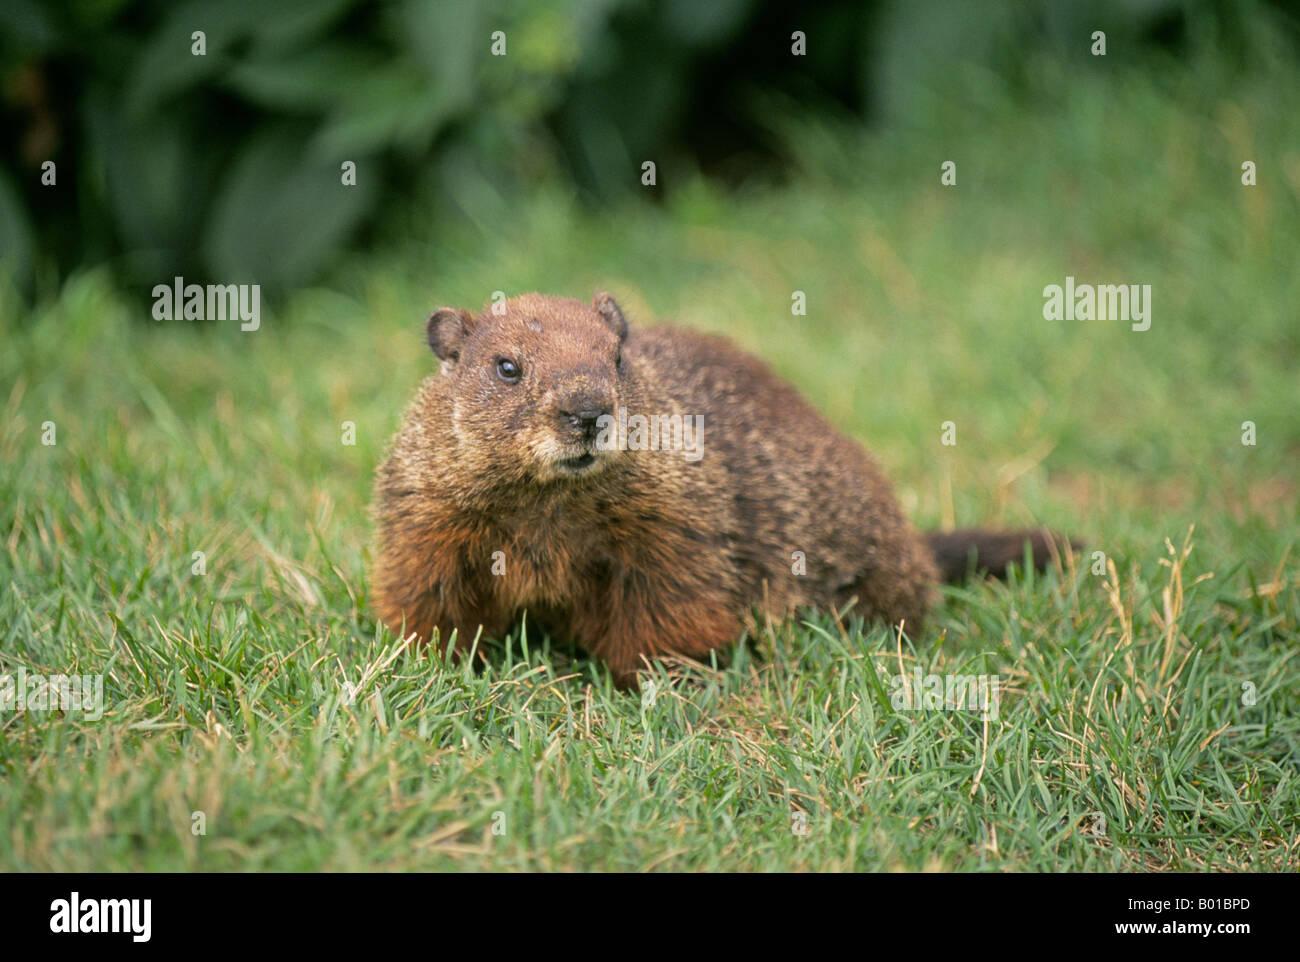 Portrait of a common woodchuck Marmota monax or groundhog - Stock Image